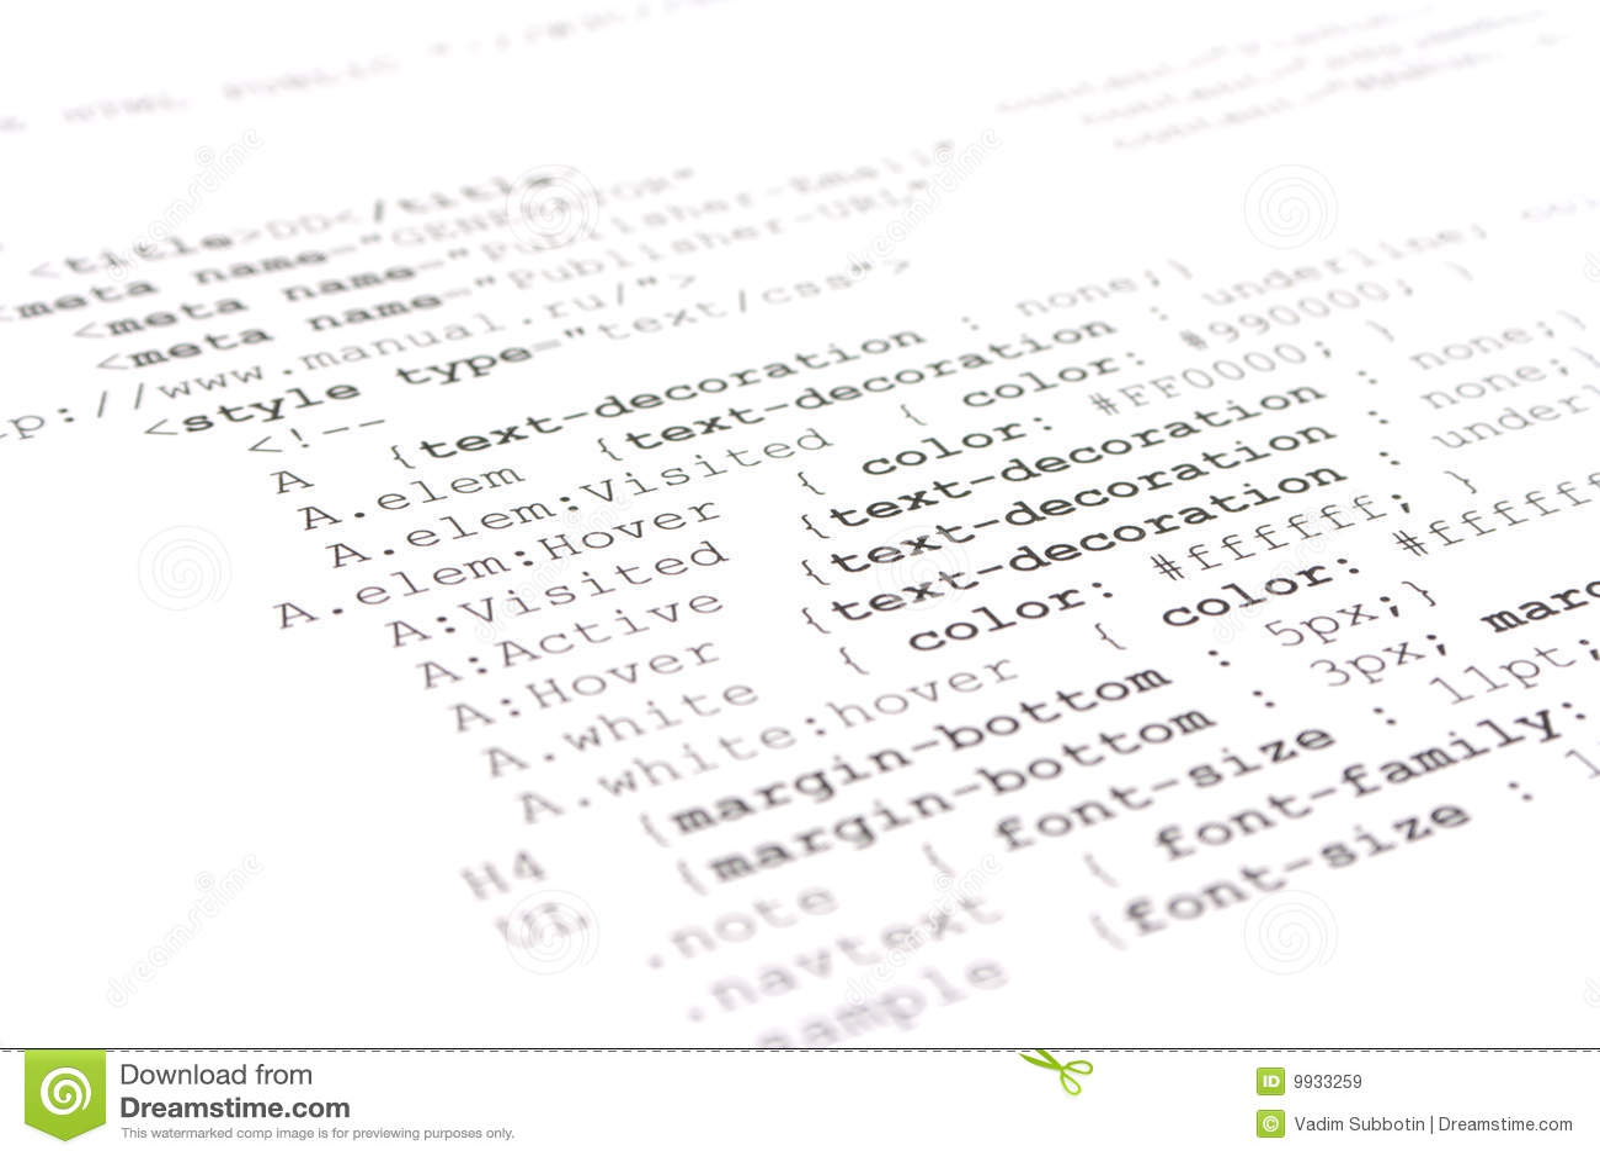 Programming html code stock image. Image of internet